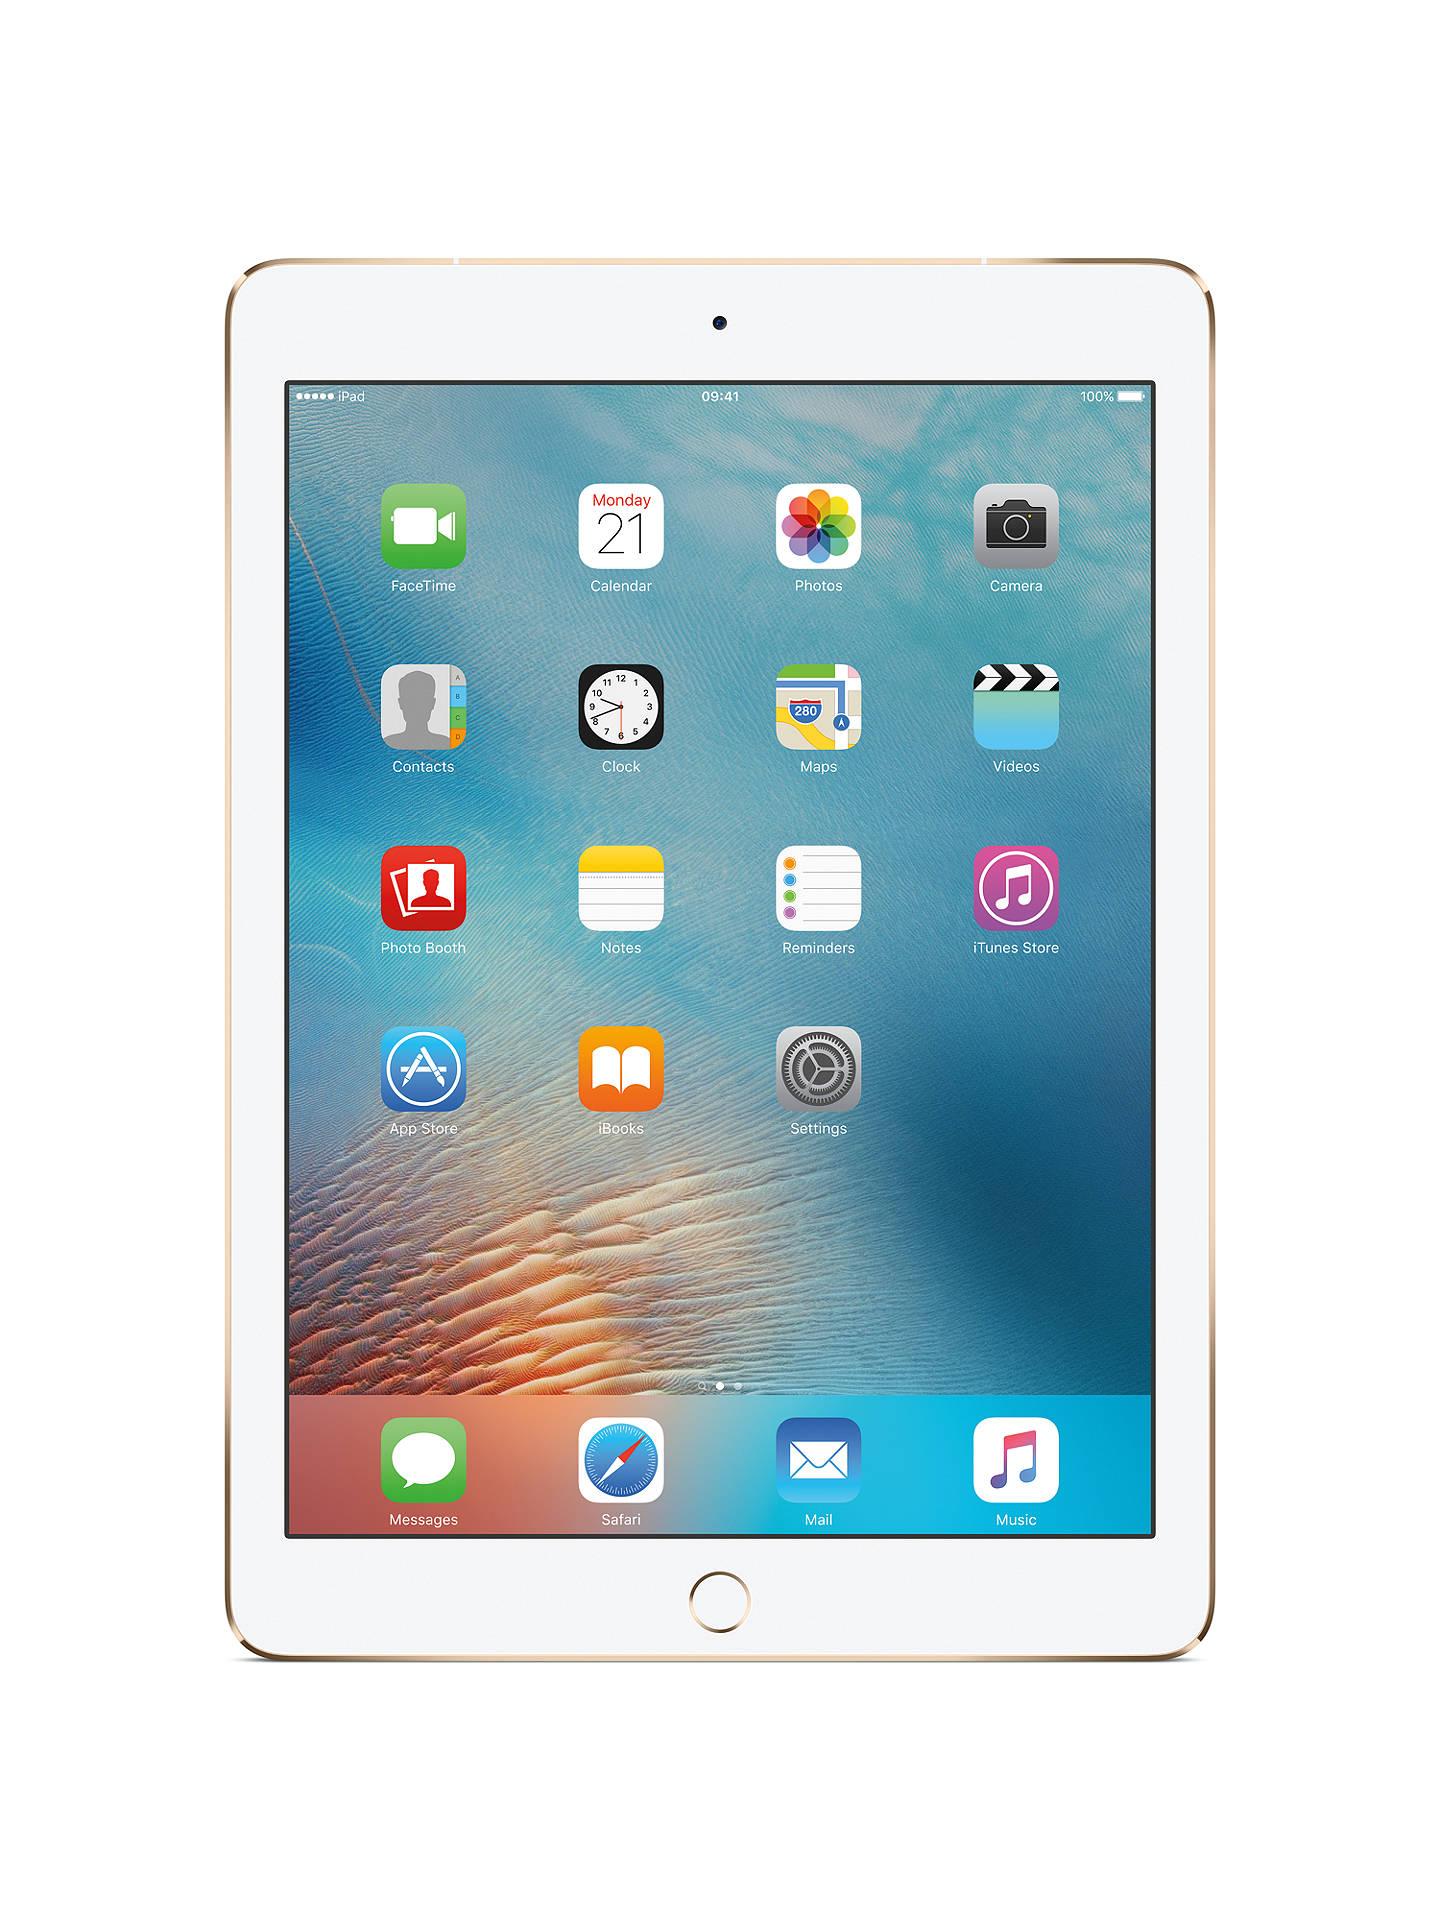 Apple Ipad Pro A9x Ios 97 Wi Fi Cellular 128gb At John Iphone 7 Black Grs International Buyapple